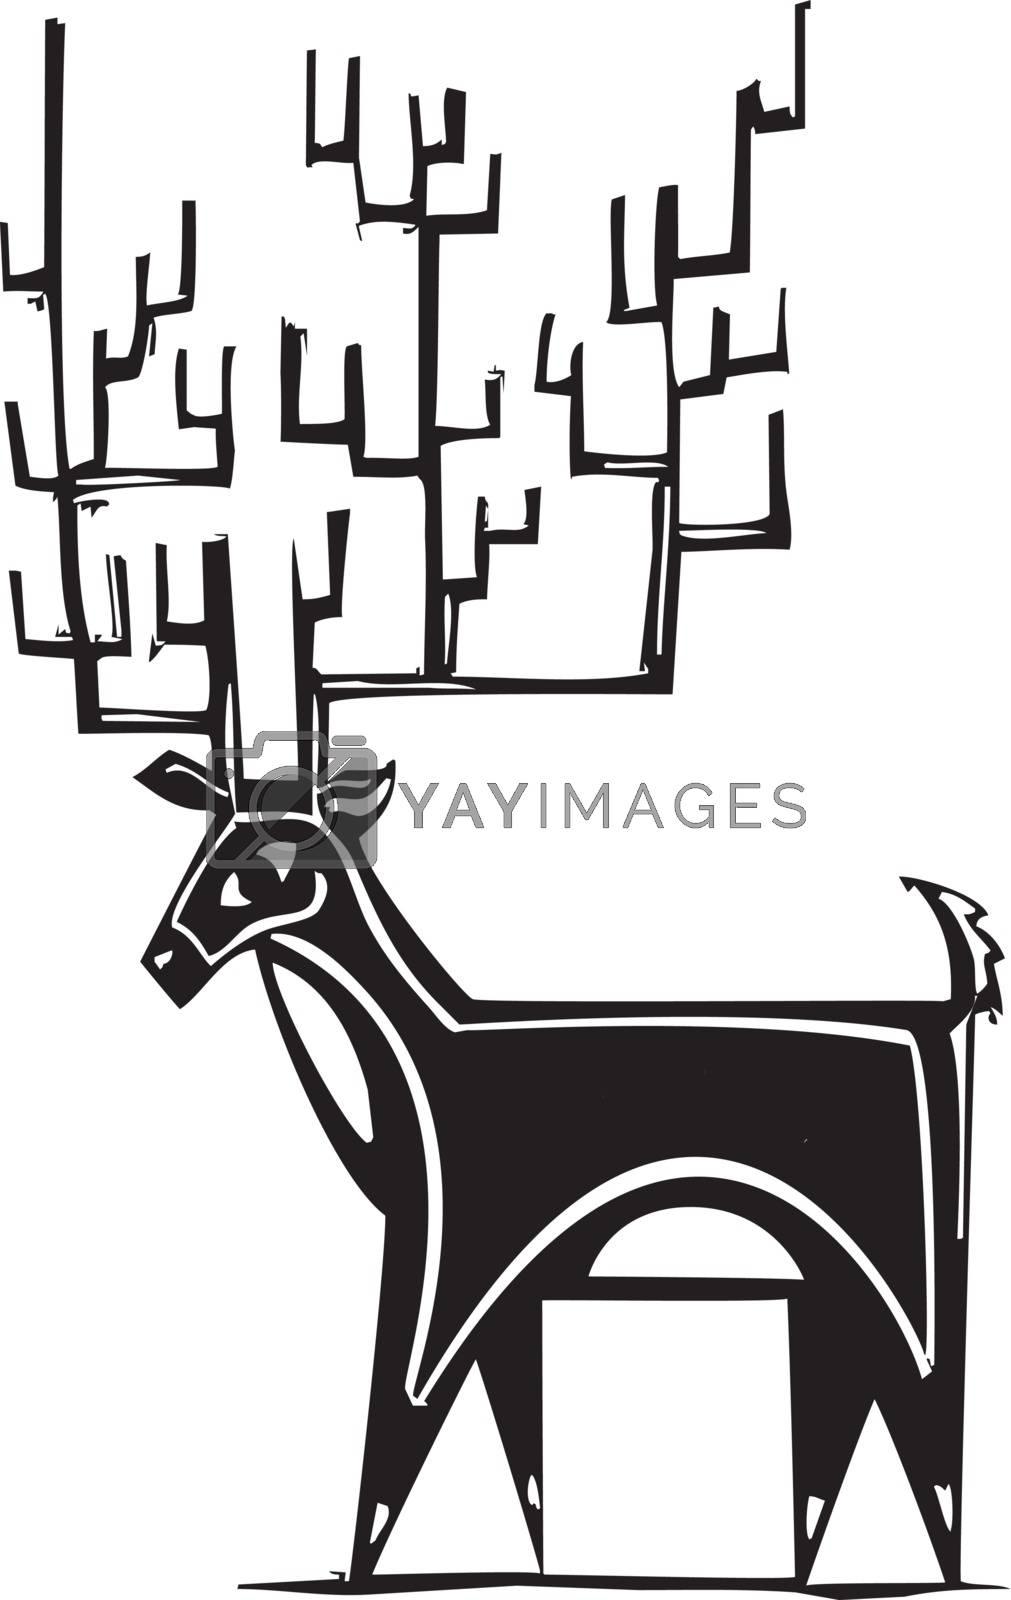 Woodcut style reindeer with a huge antler rack.